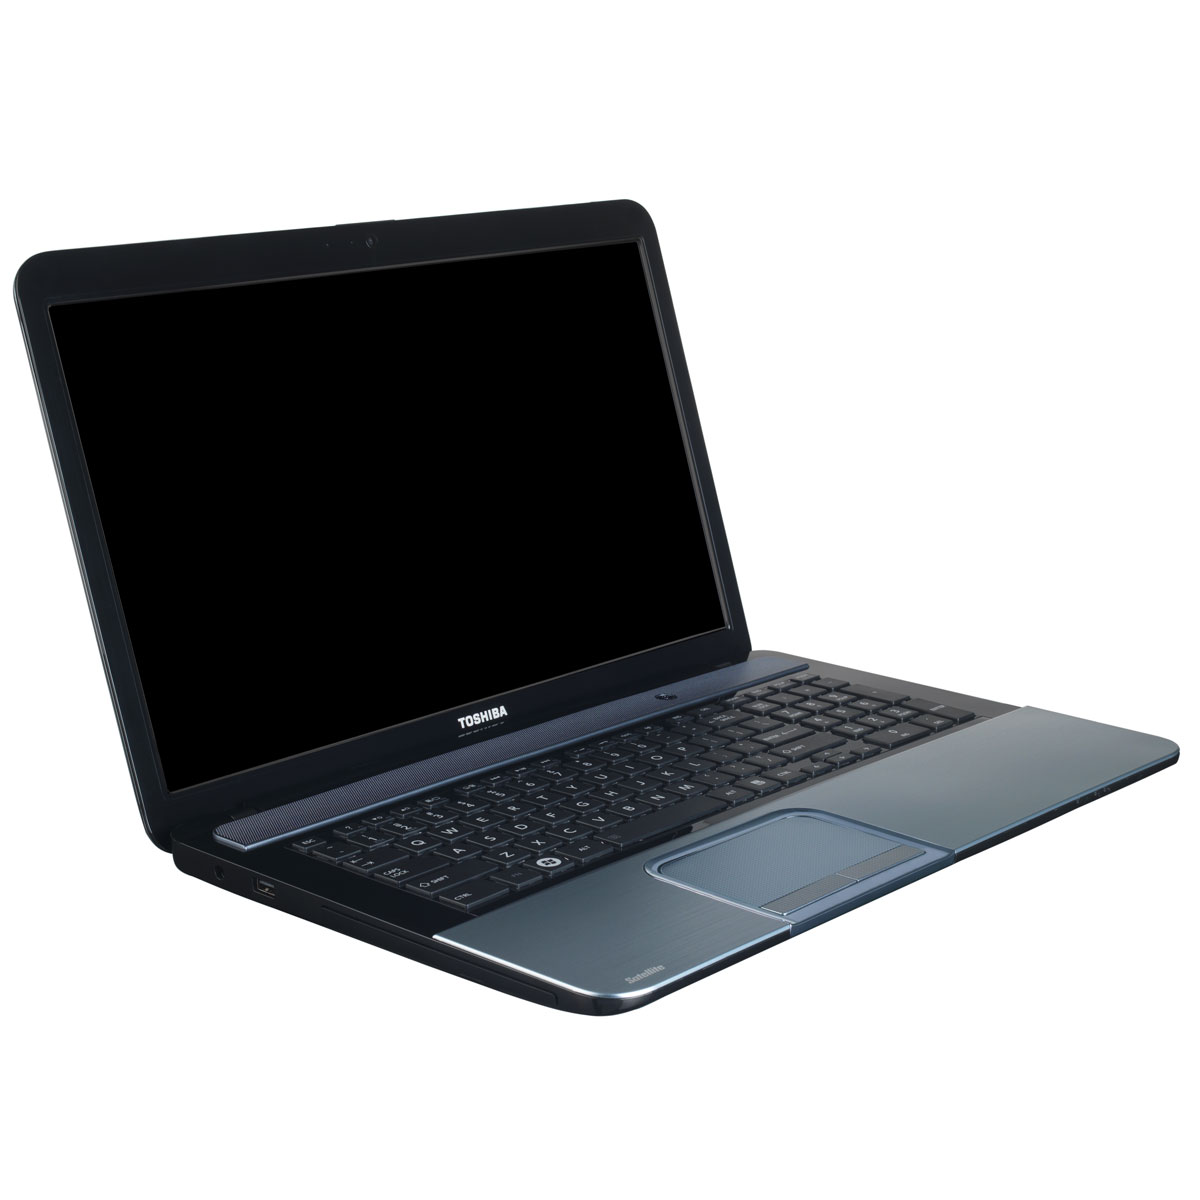 "PC portable Toshiba Satellite L875-10G Intel Core i5-2450M 8 Go 1 To 17.3"" LED AMD Radeon HD 7670M Graveur DVD Wi-Fi N/BT Webcam Windows 7 Premium 64 bits"